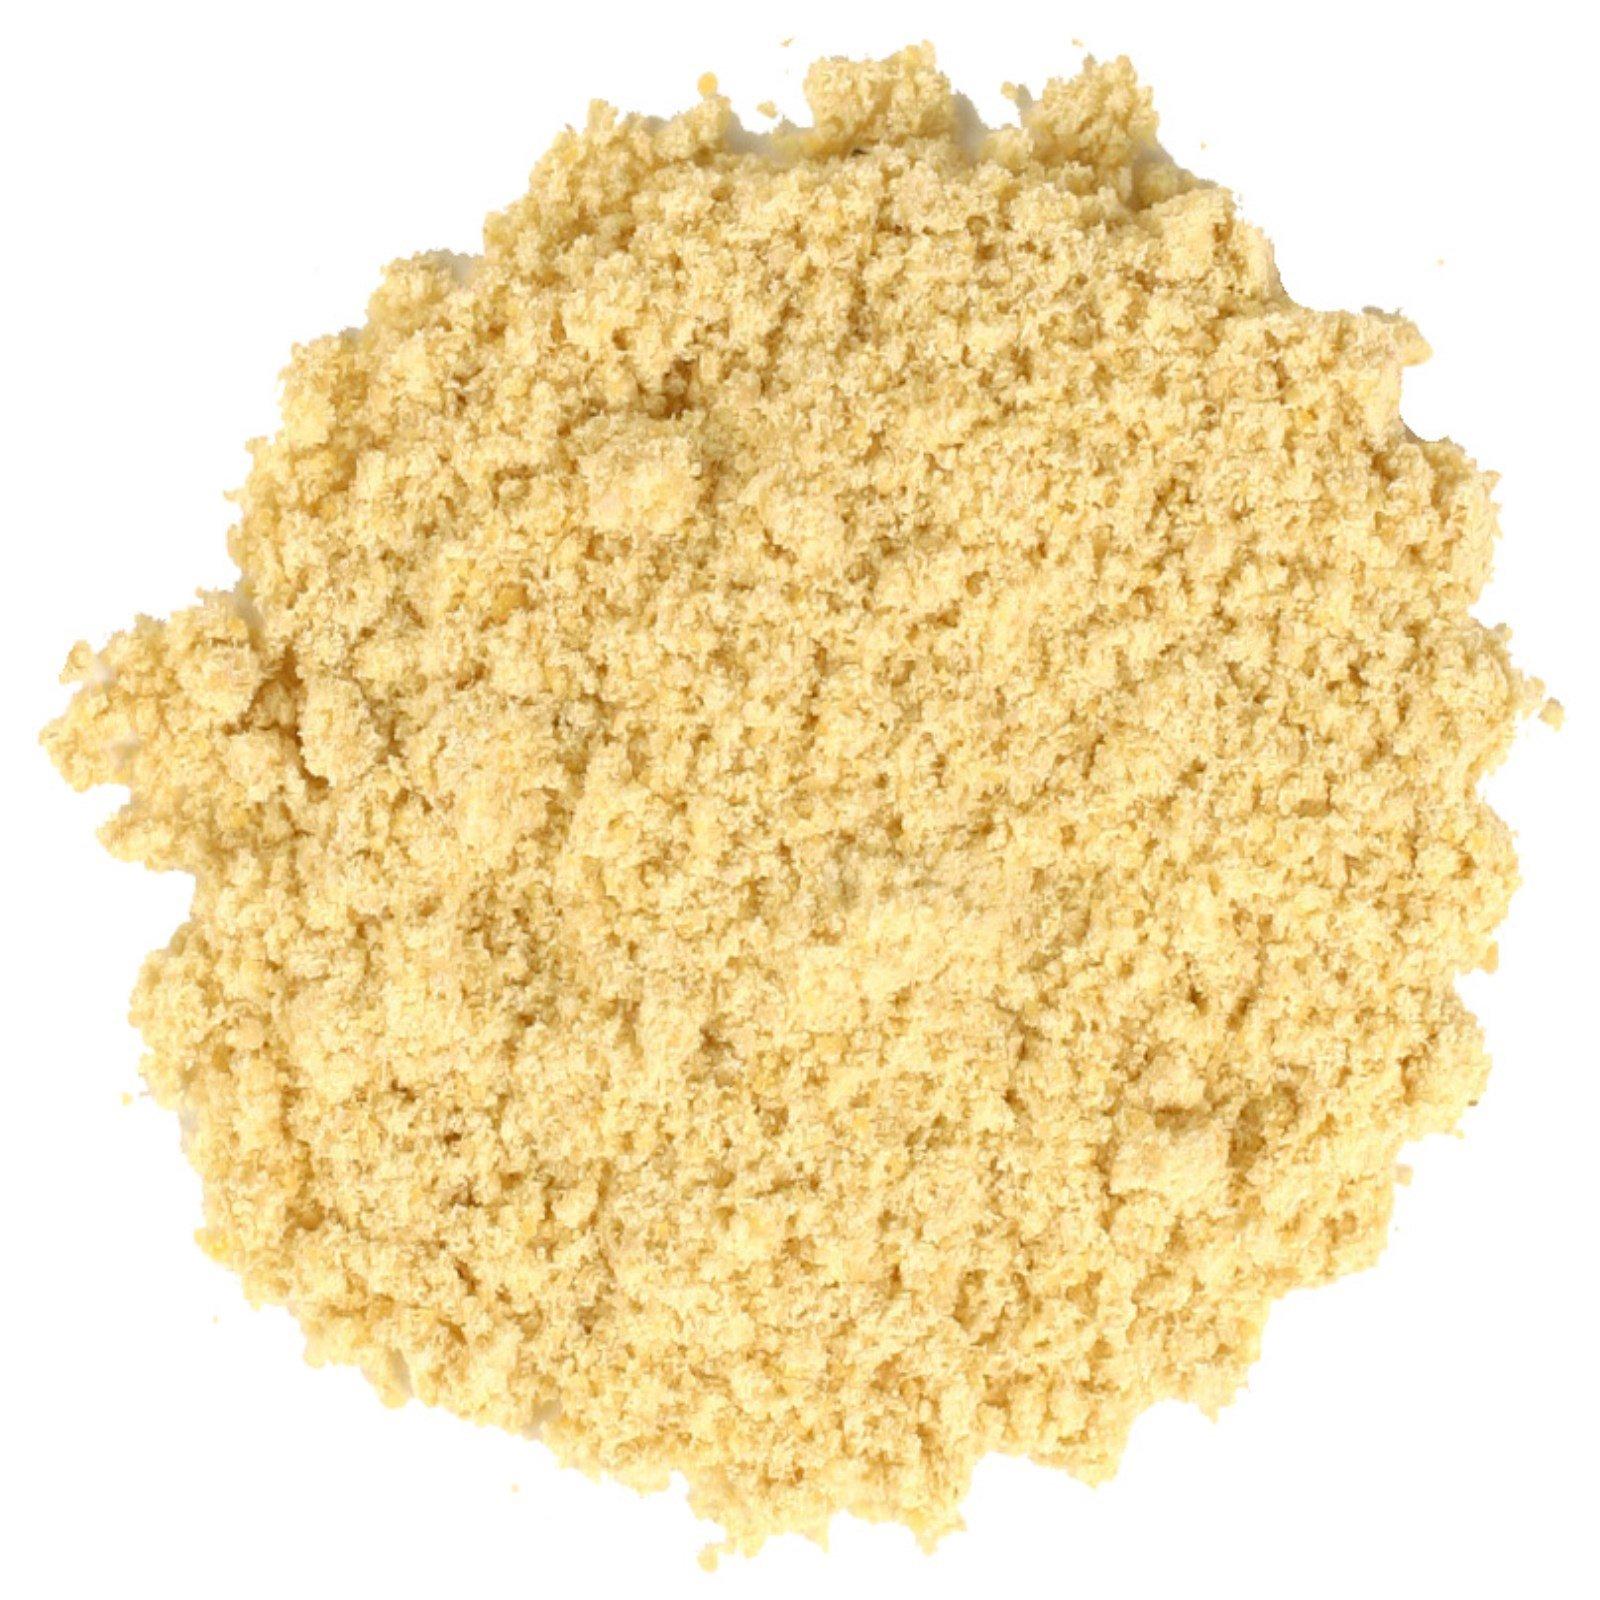 Frontier Natural Products, Органические молотые семена желтой горчицы, 16 унций (453 г)